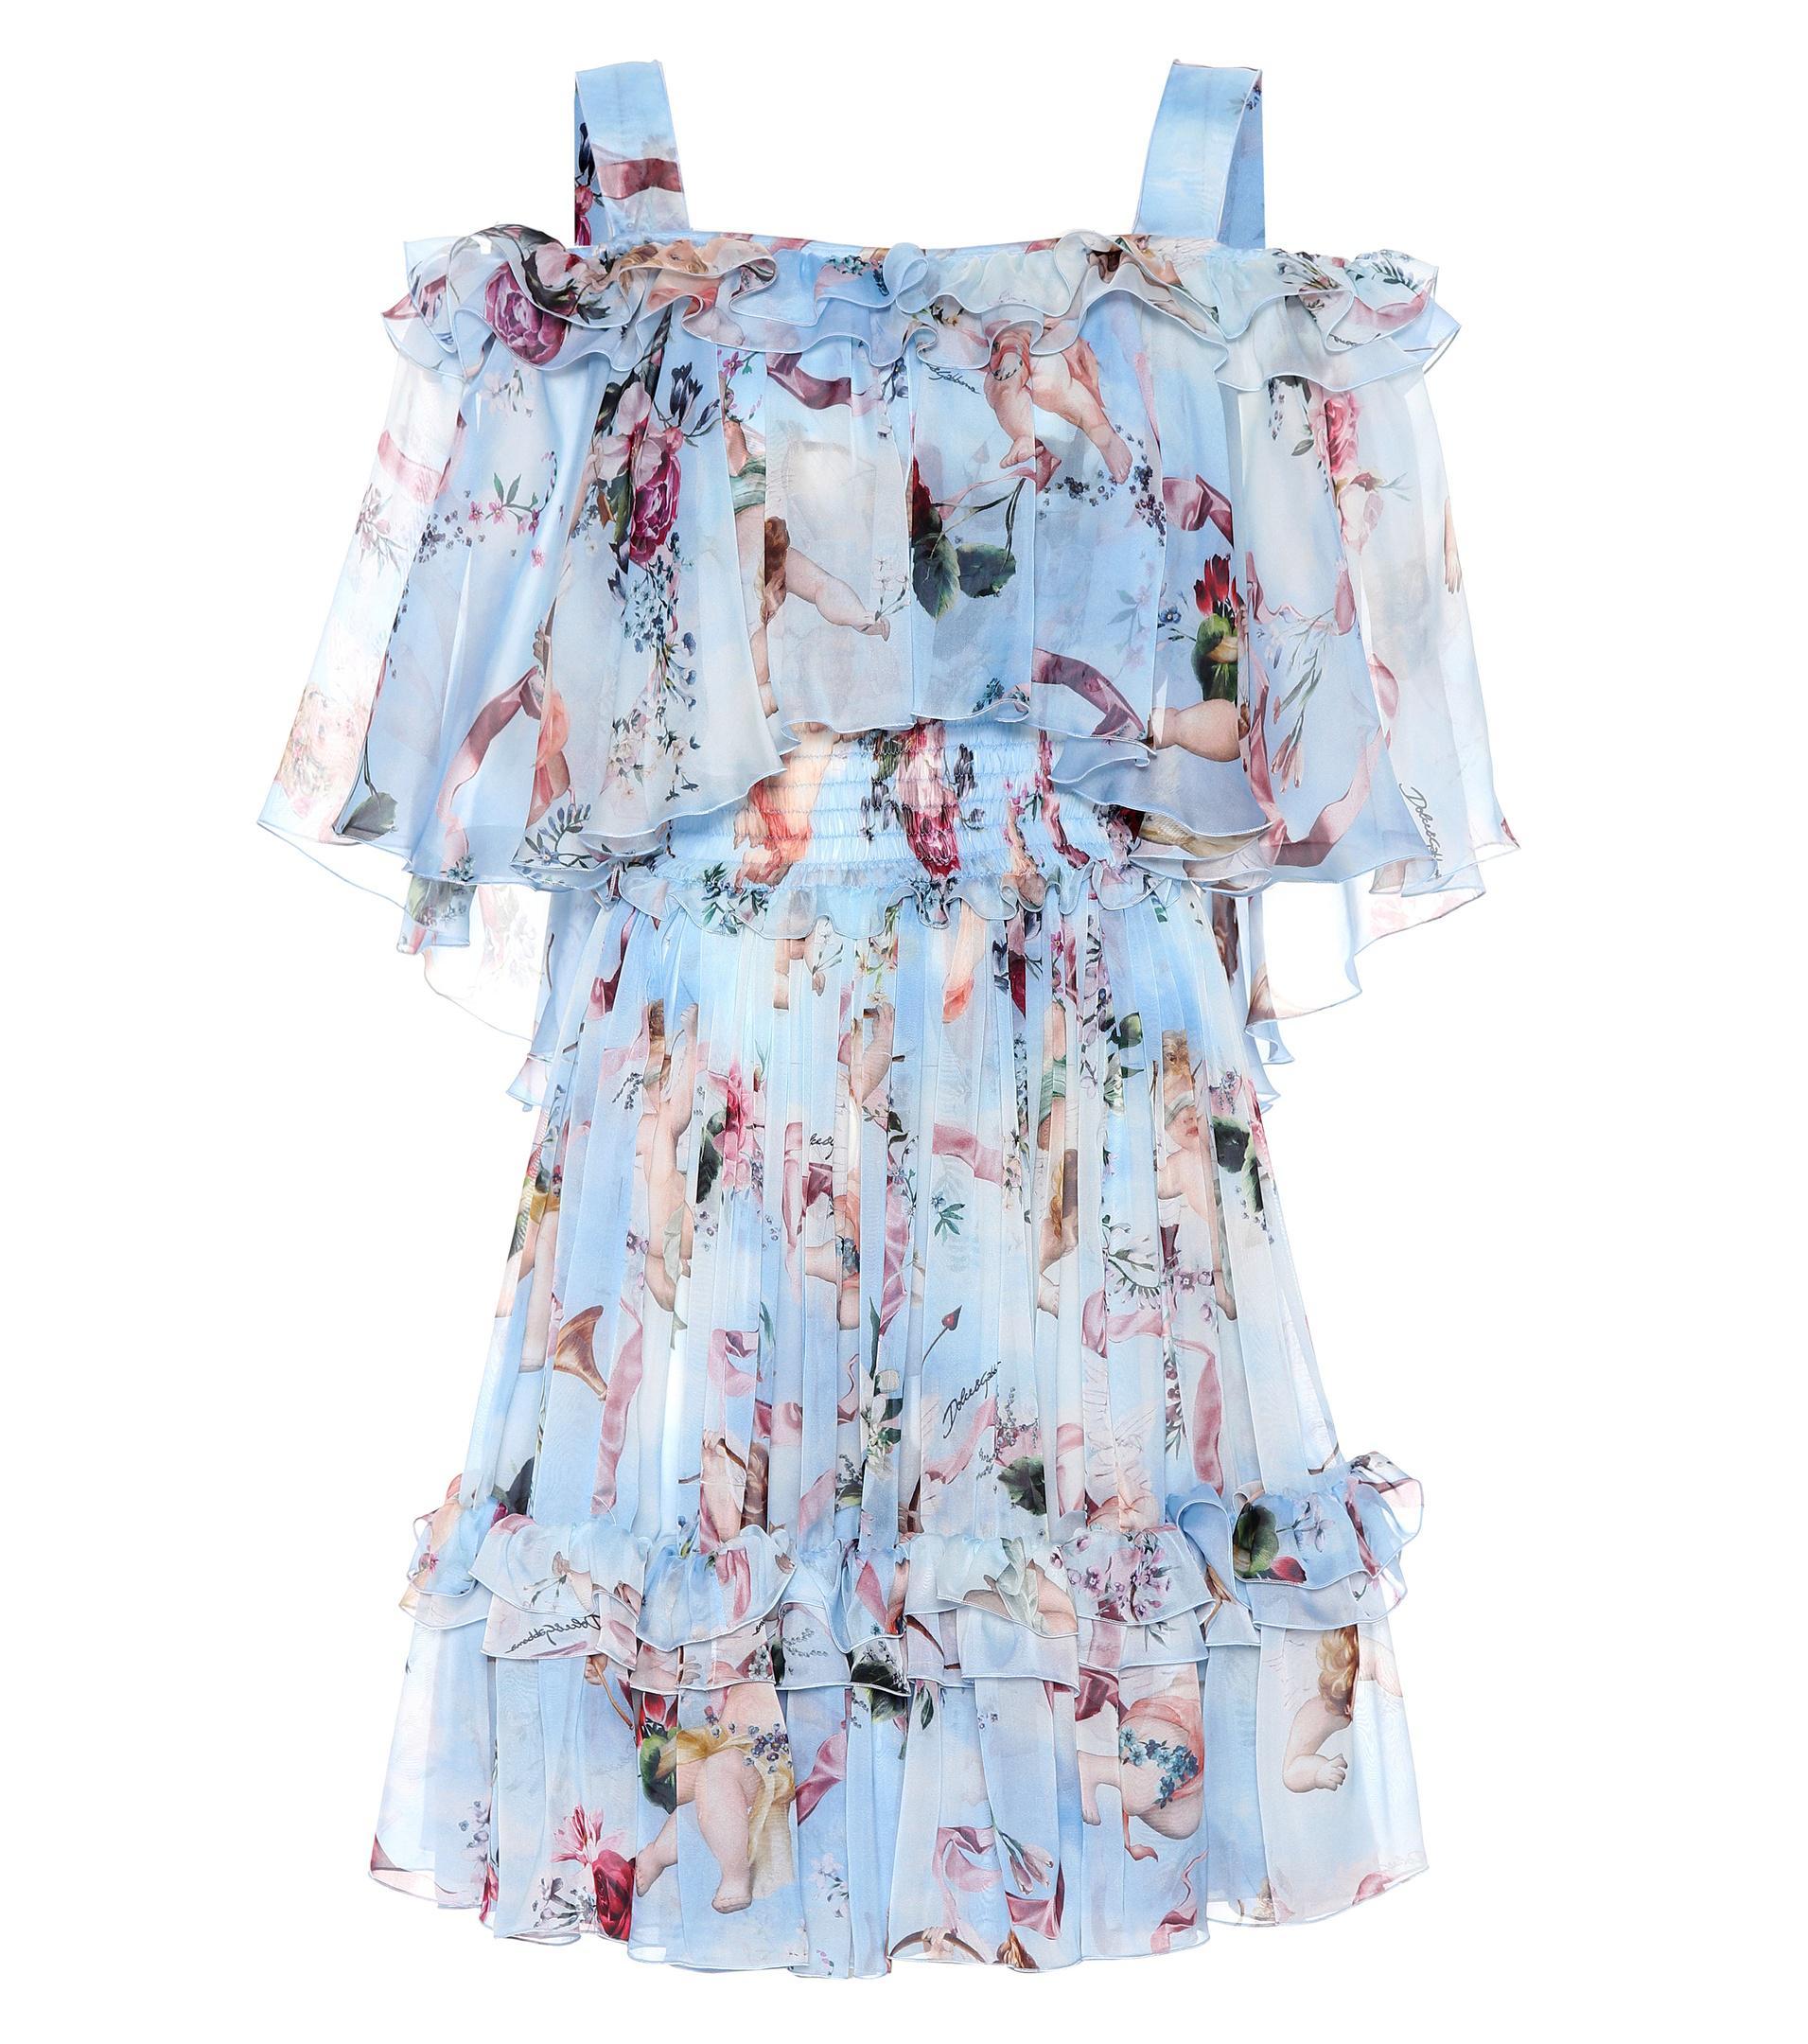 dc75eb11 Dolce & Gabbana Floral Silk Off-the-shoulder Dress in Blue - Lyst